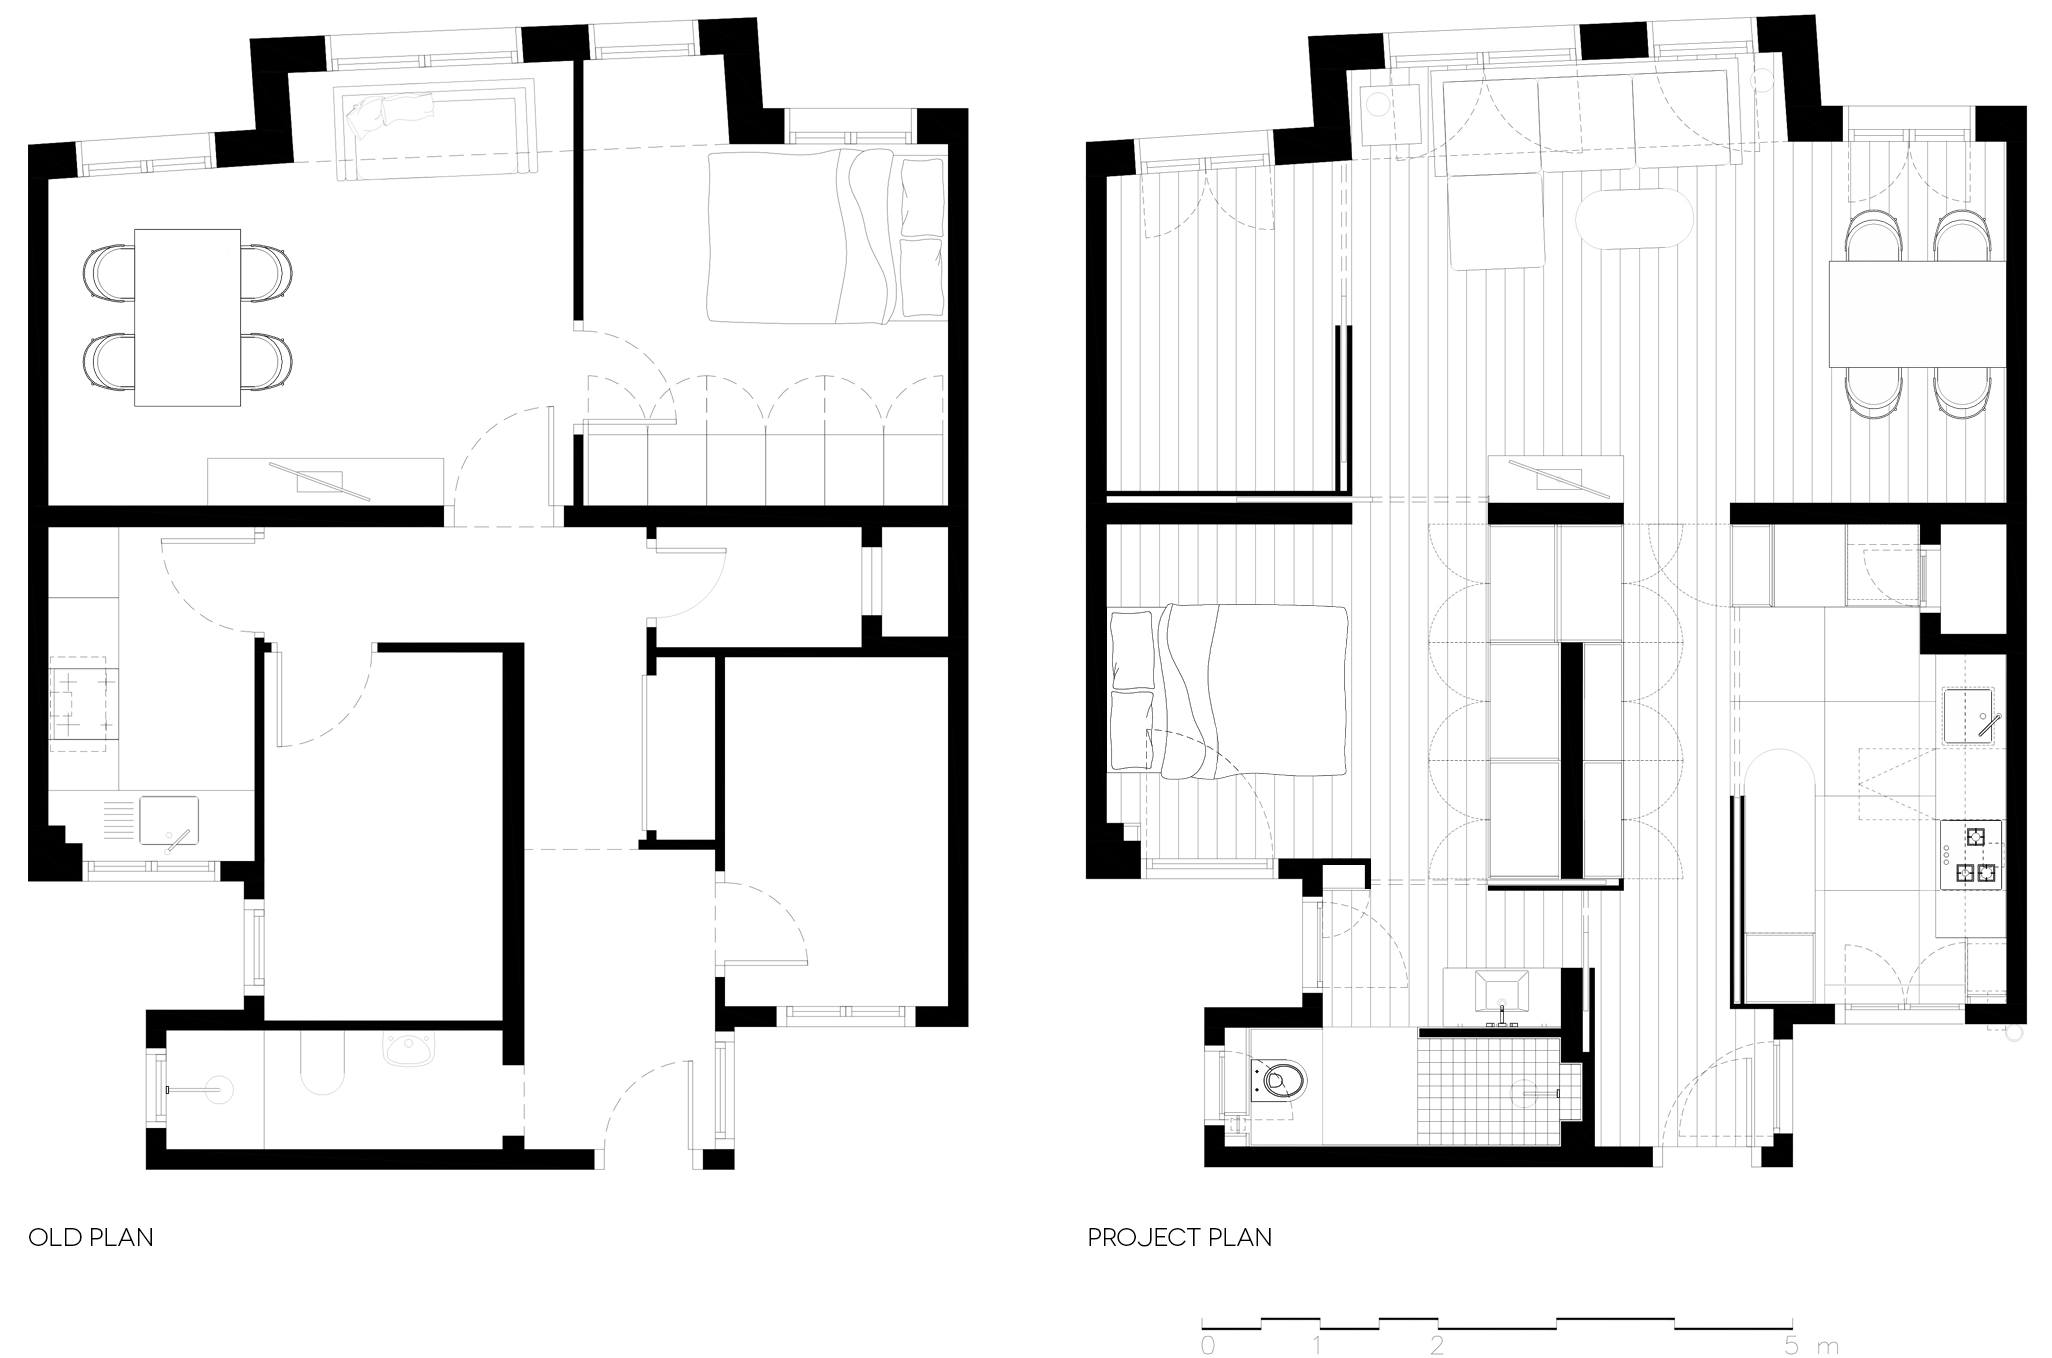 Paola_Bagna_Apartment_CC52_BCN_10